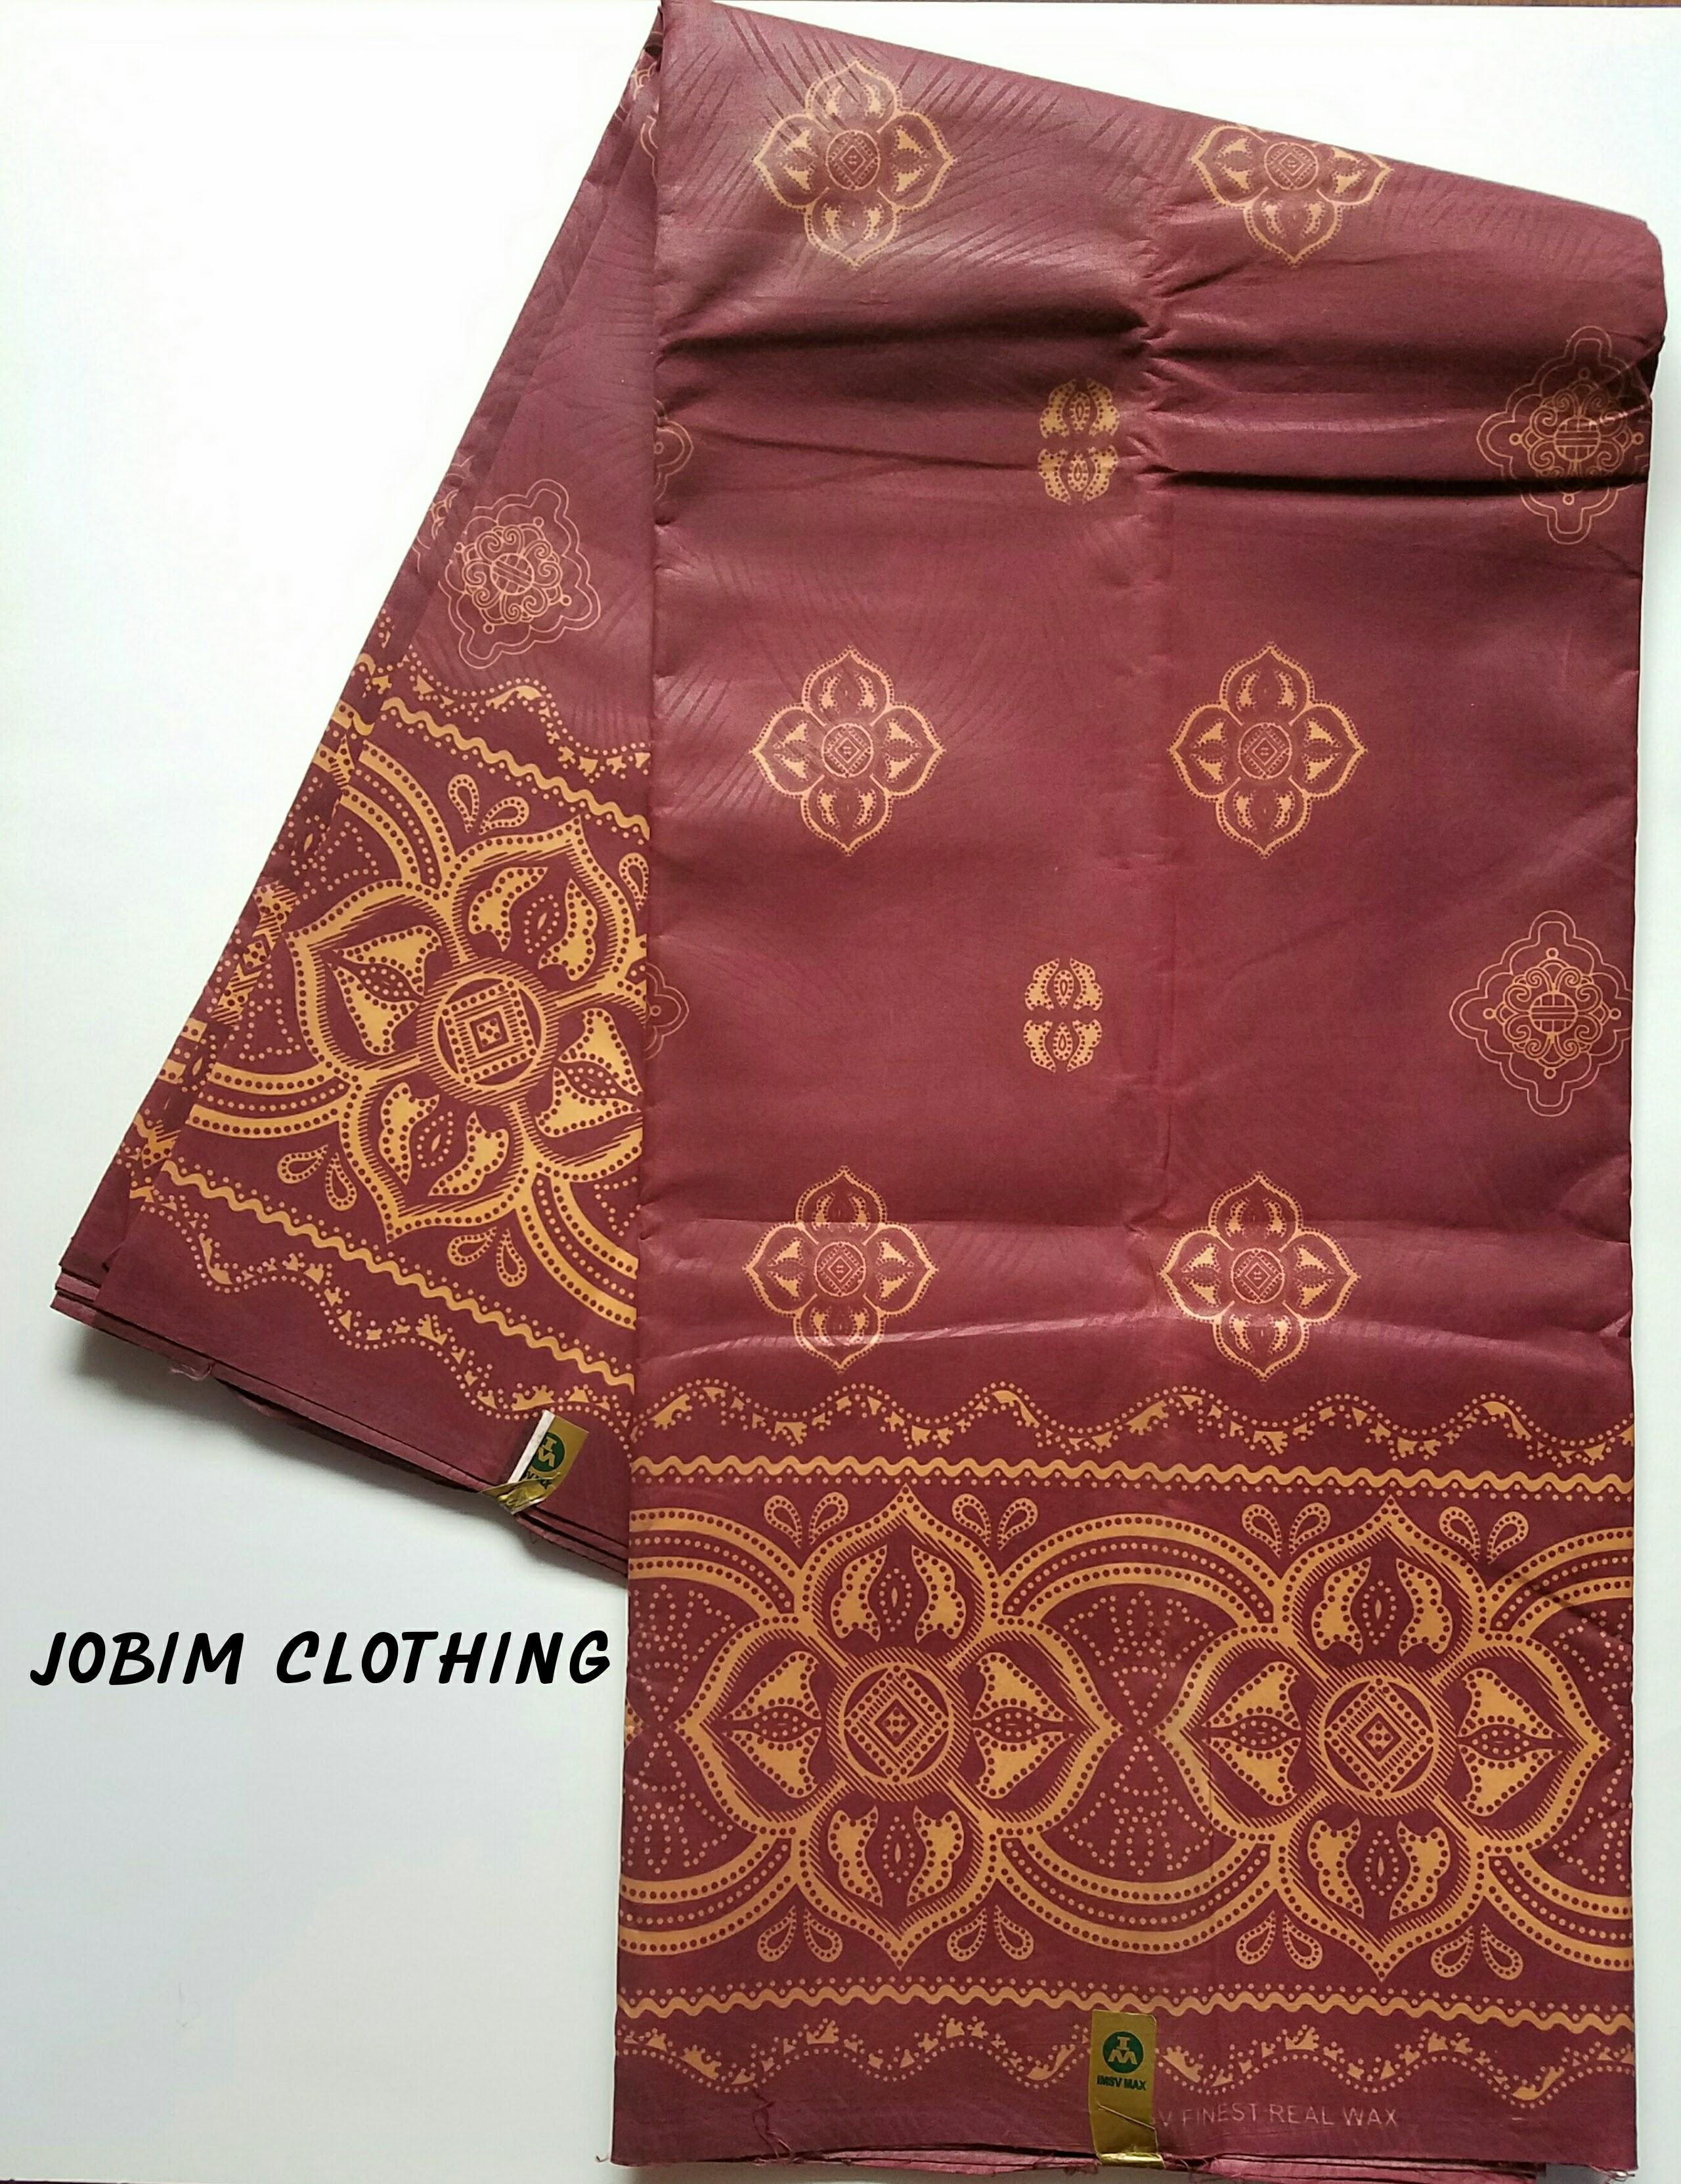 Jobim Clothing Ankara Fabric 100